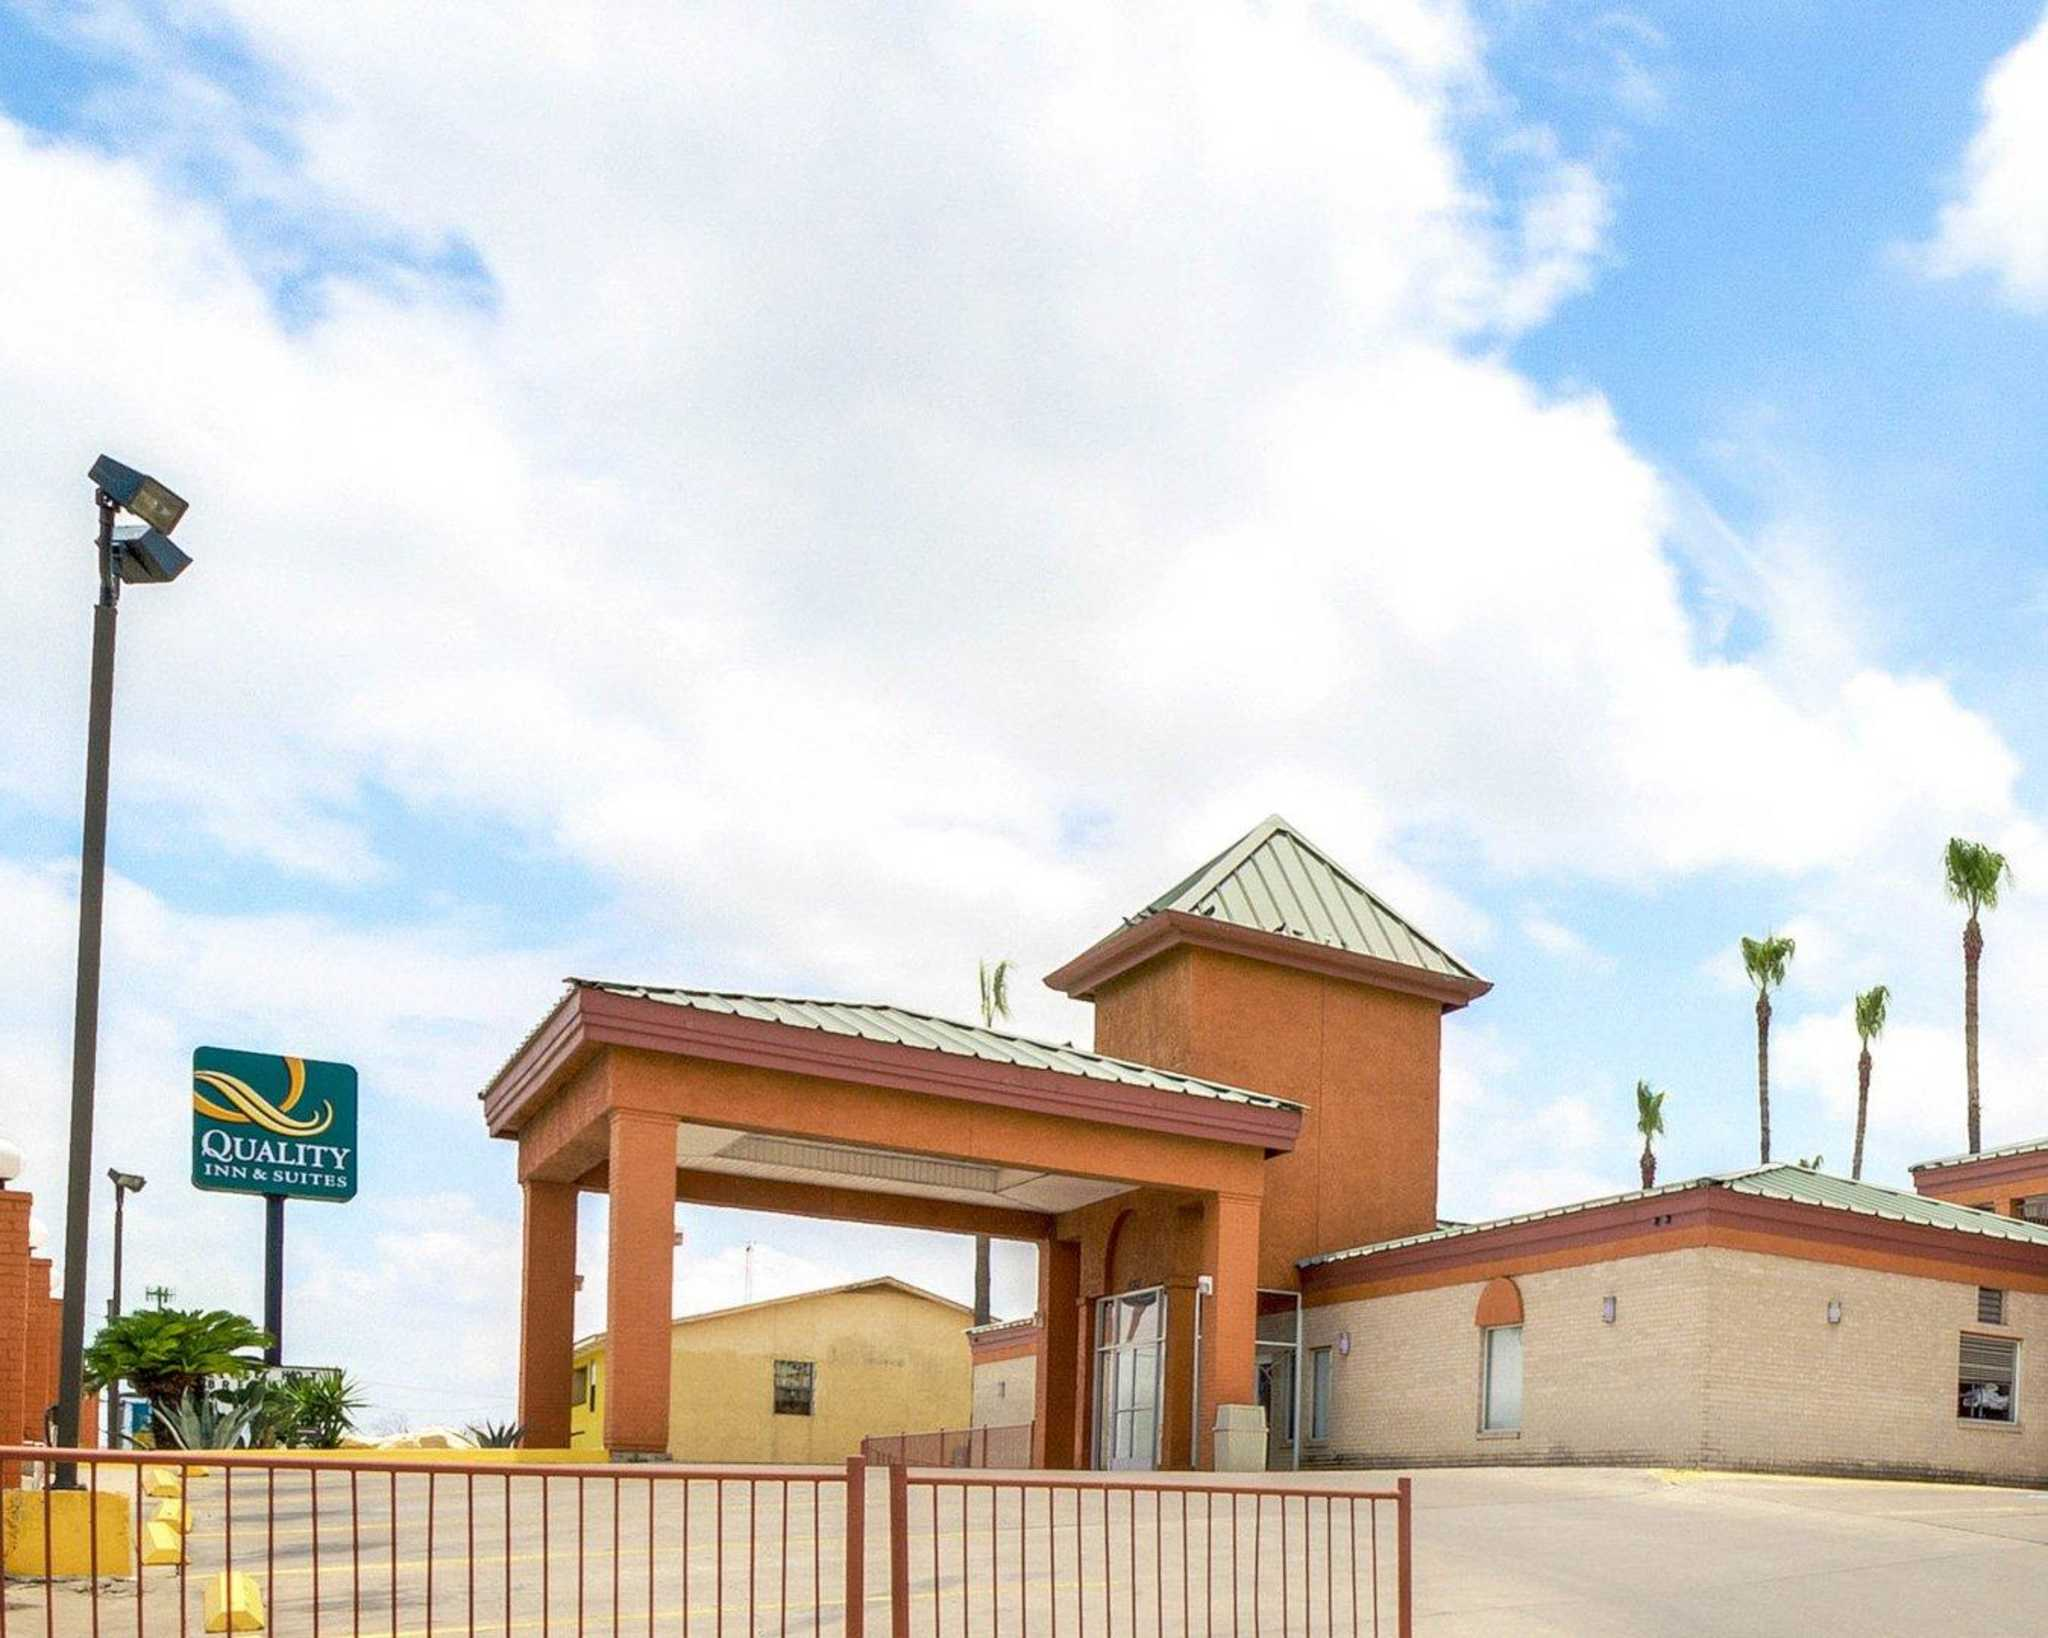 Quality Inn & Suites Eagle Pass image 0